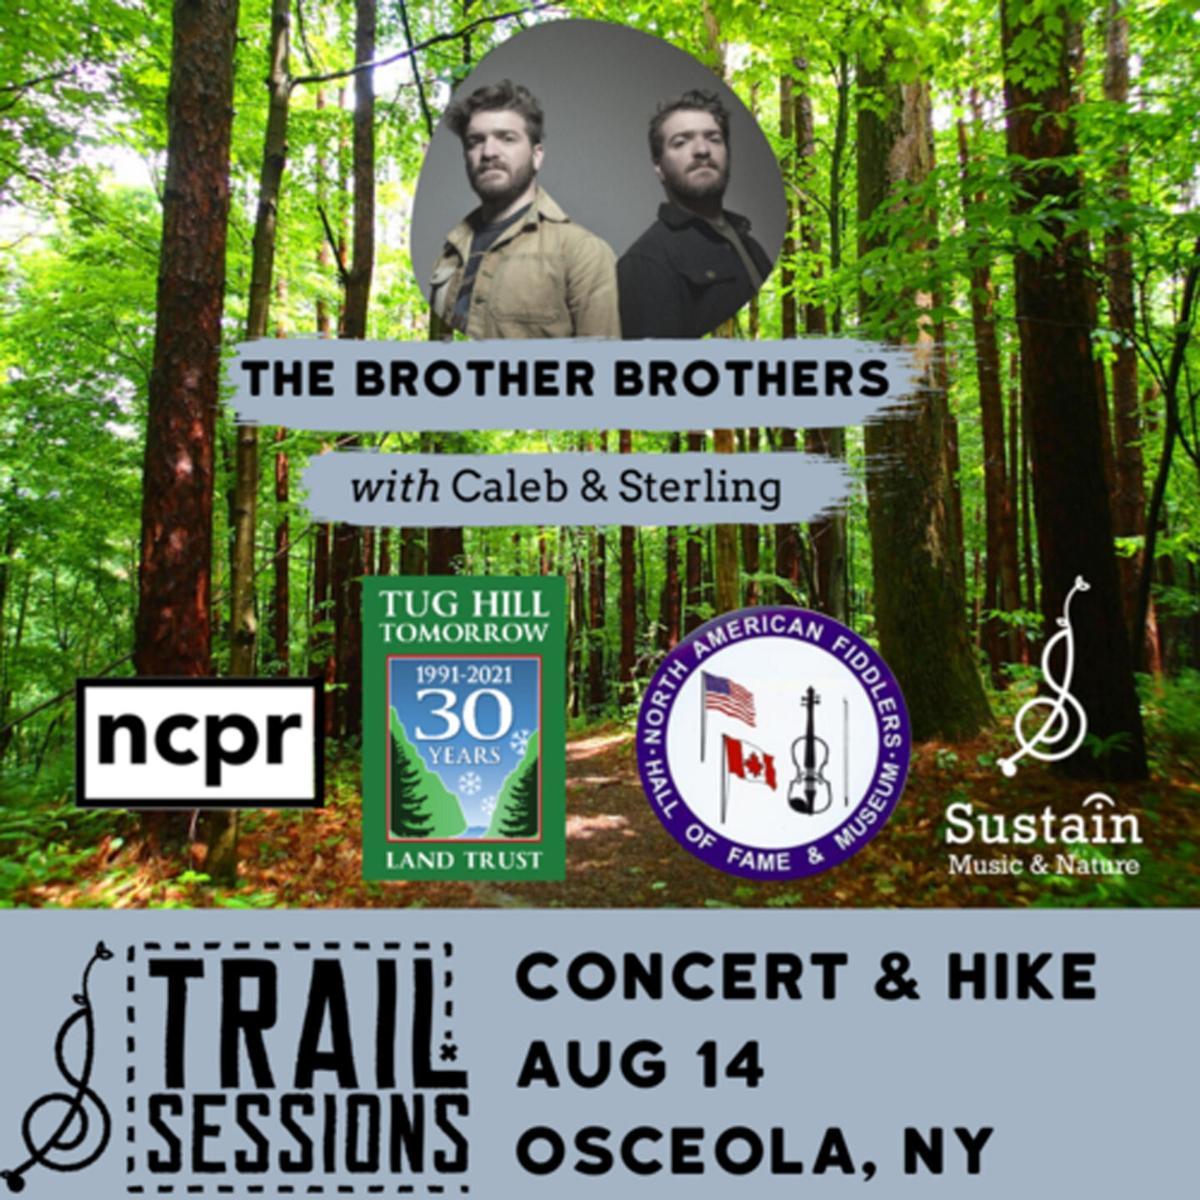 Tug Hill event has music, hiking